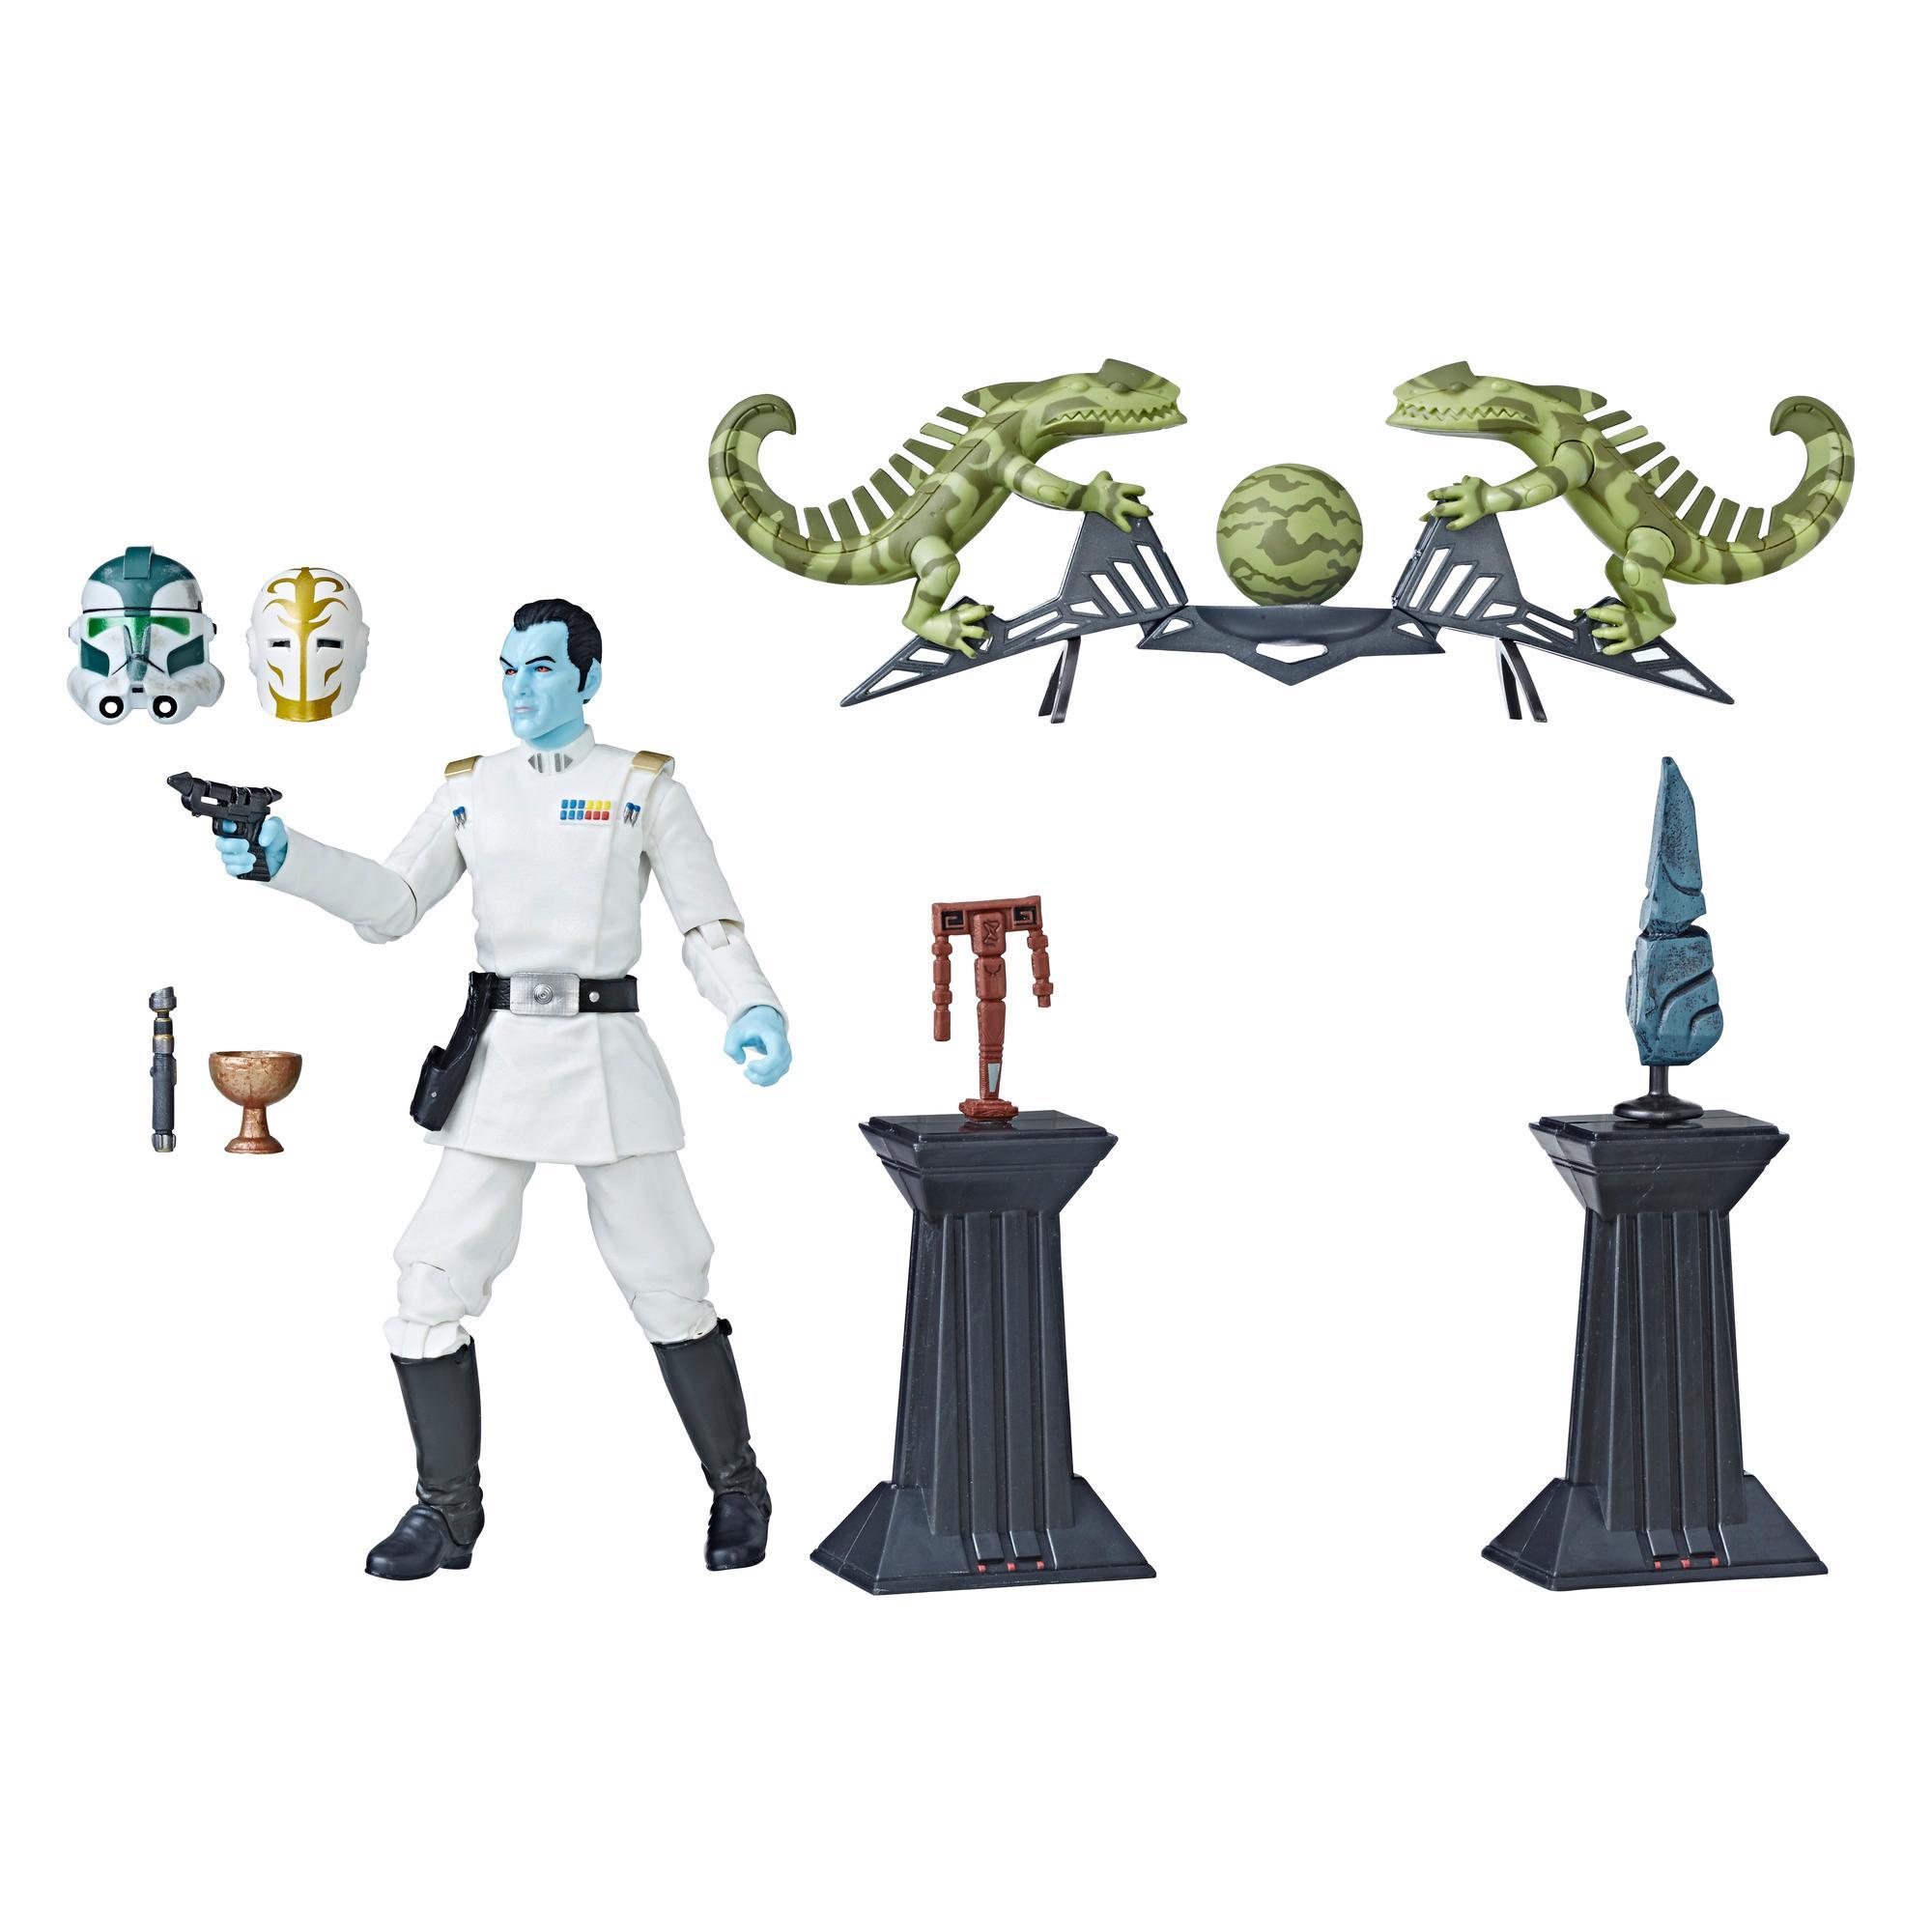 Star Wars The Black Series - Grand Admiral Thrawn